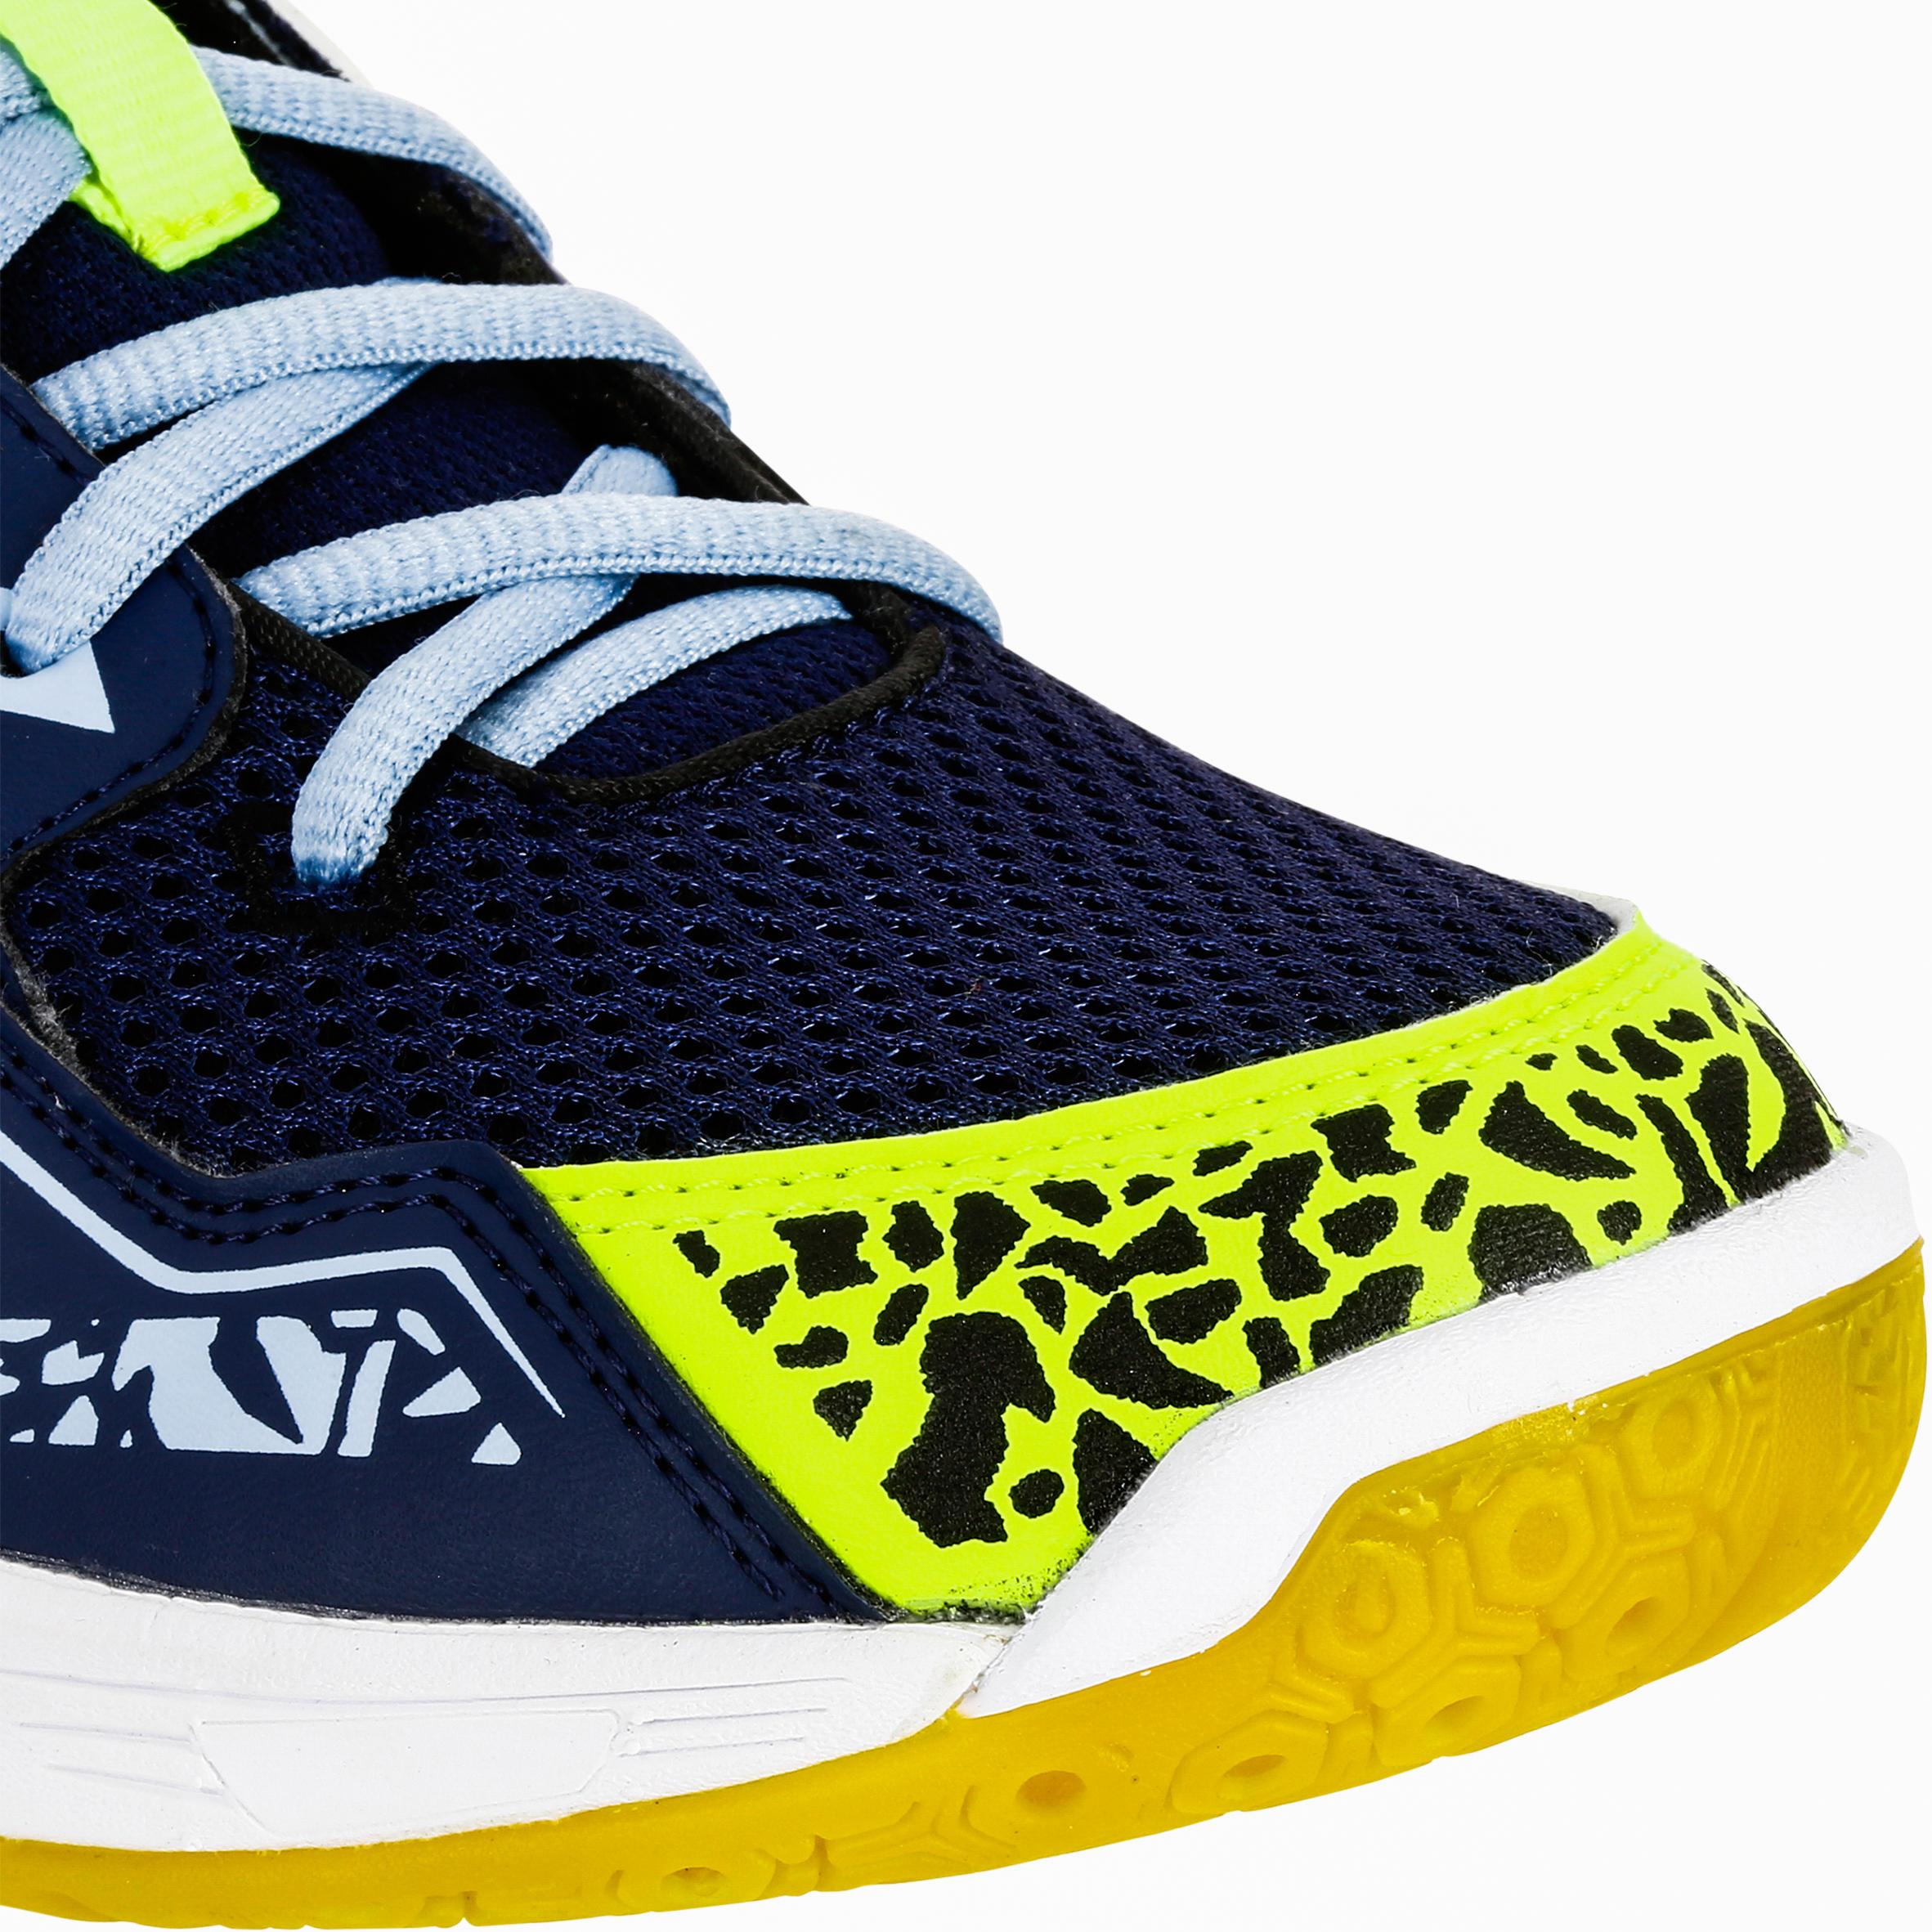 H100 Boys' Hook&Loop Handball Shoes - Blue/Yellow